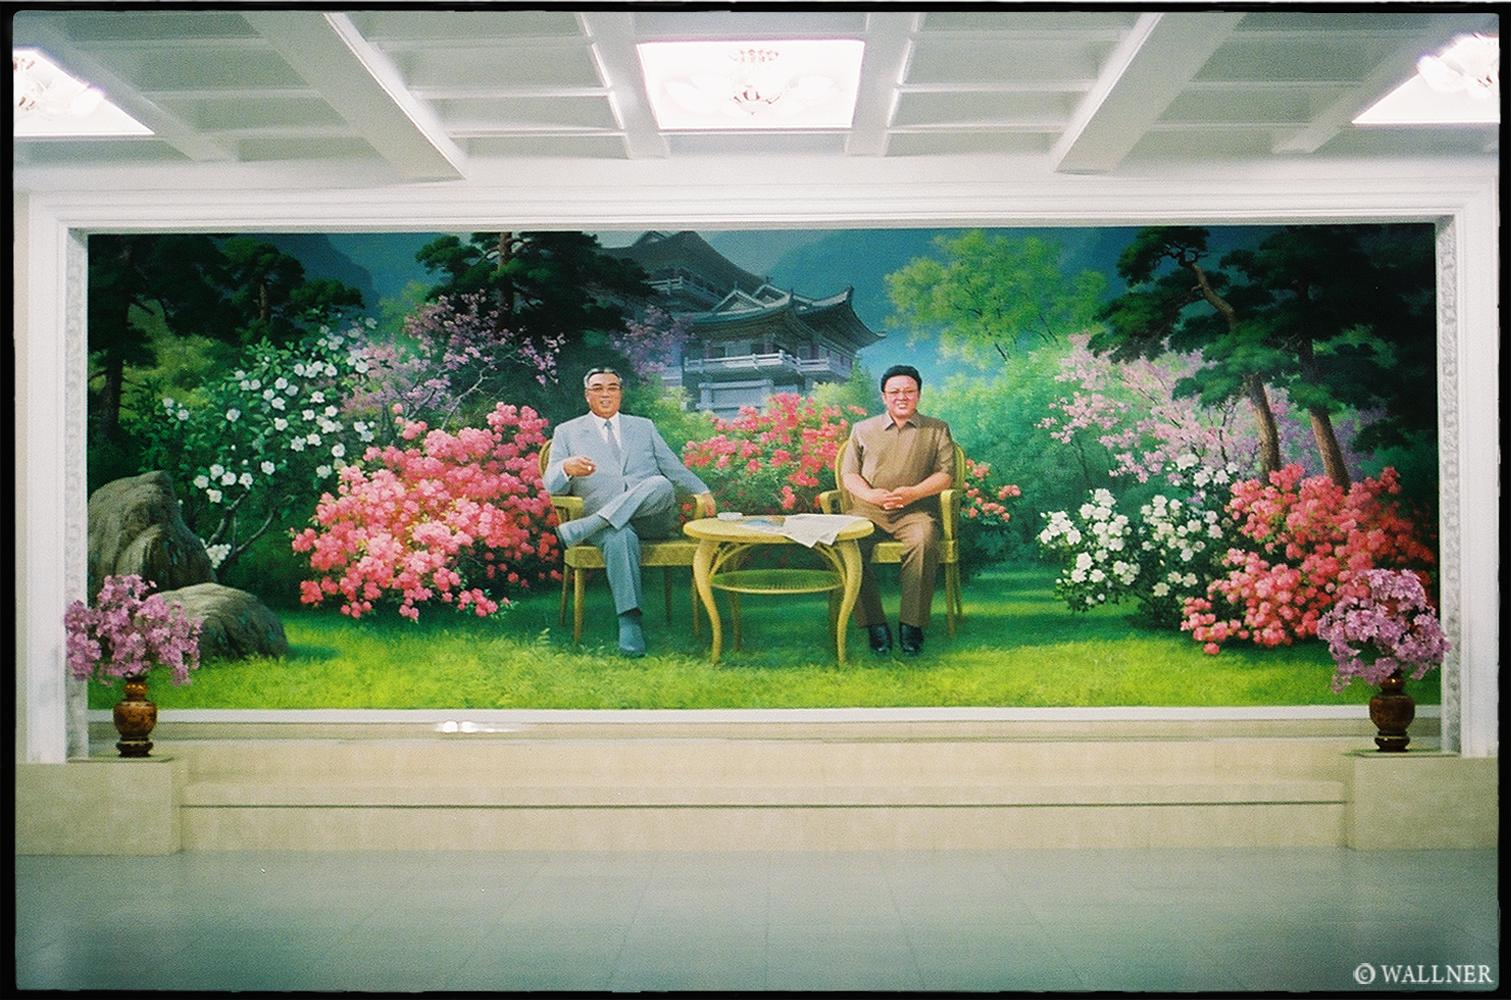 35mmPatrikWallner_Pyongyang_HotelWelcomeWideLOWQ